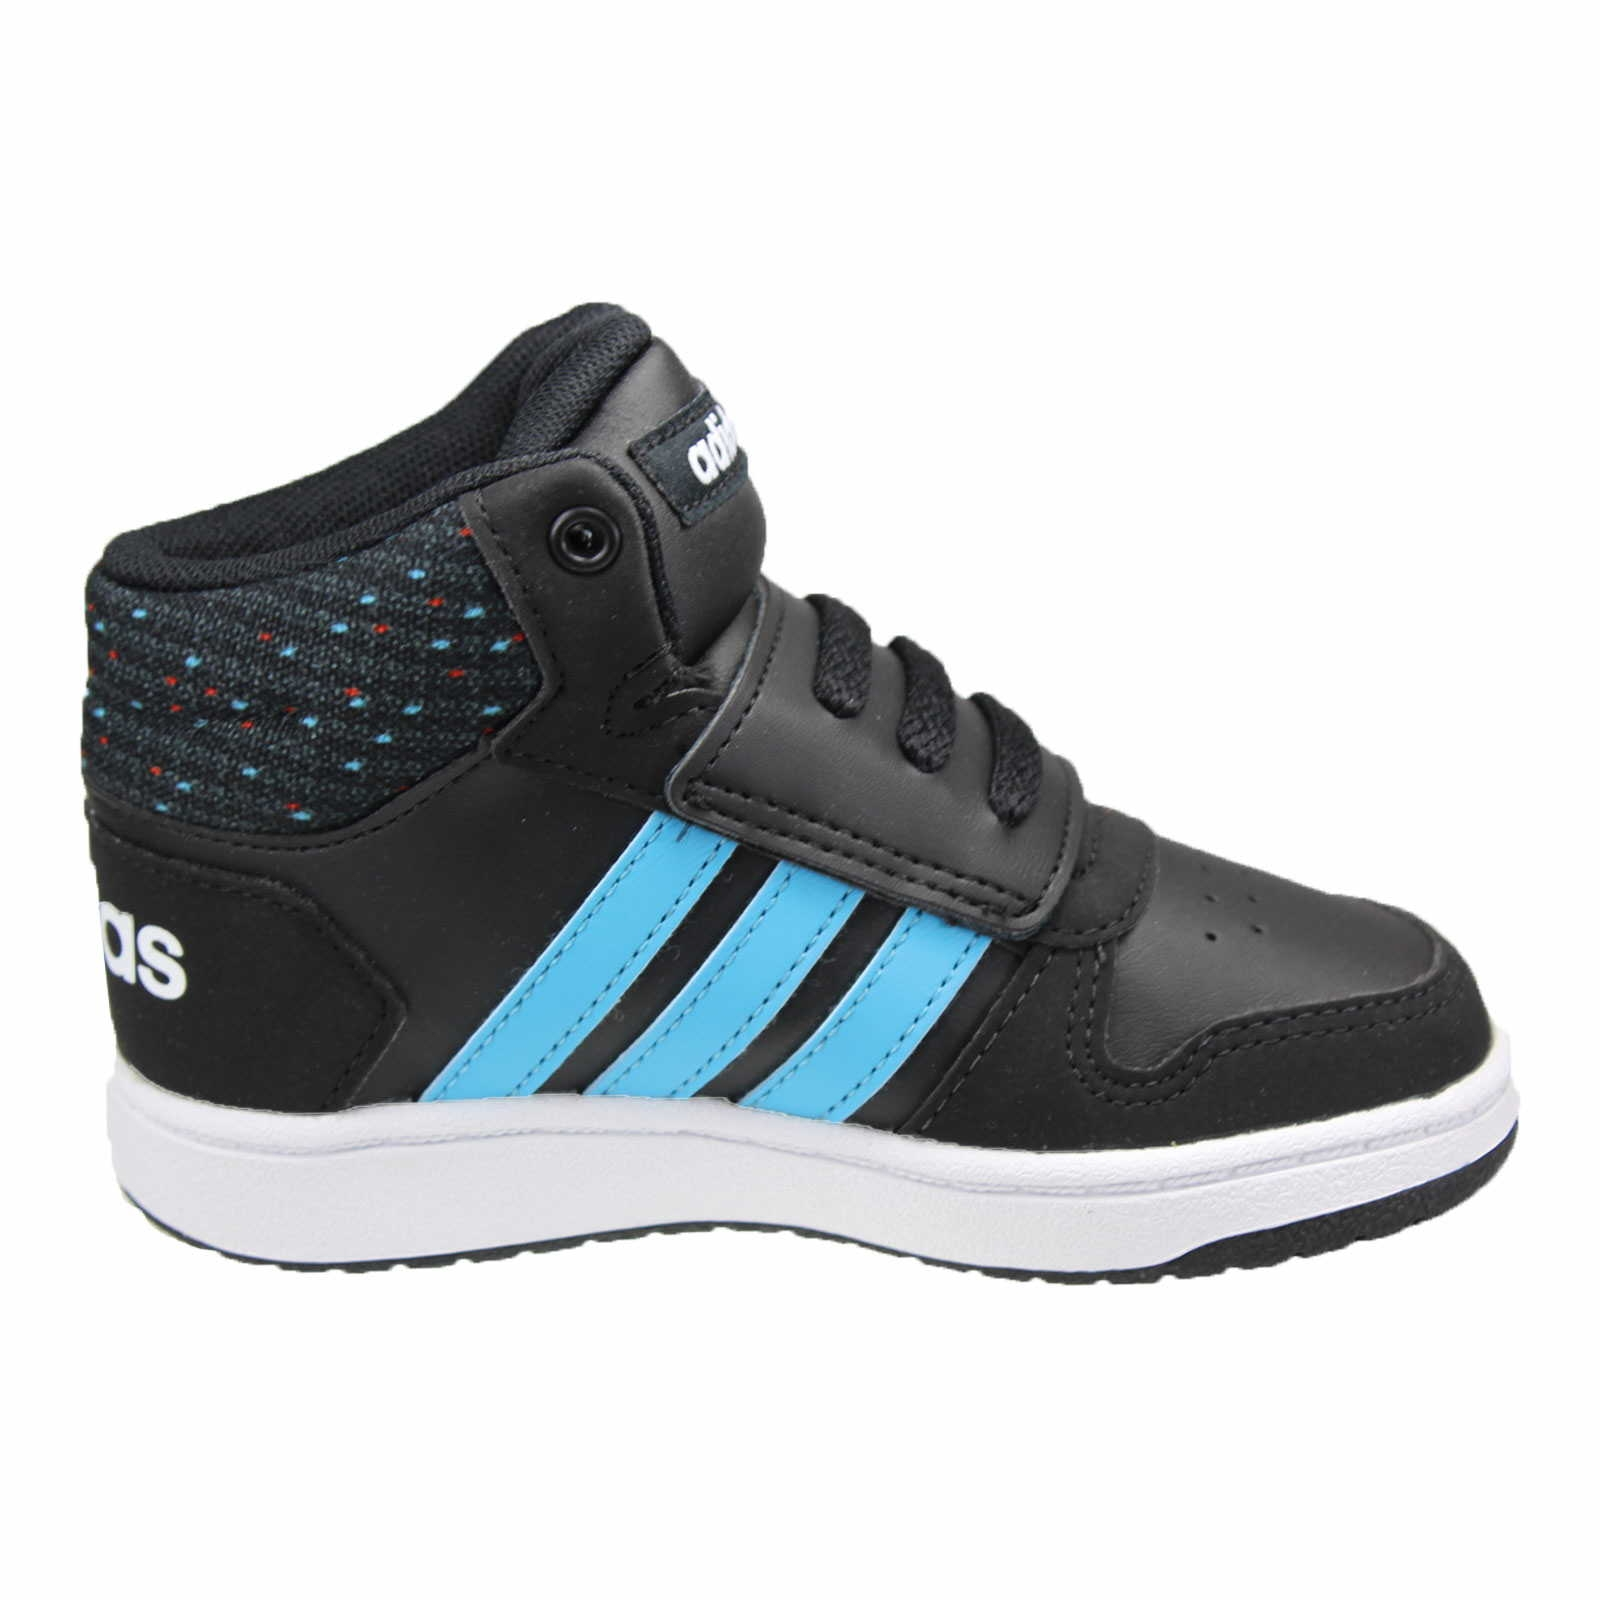 Sportstiefel Adidas Sportstiefel Adidas SchwarzSchuhparadies